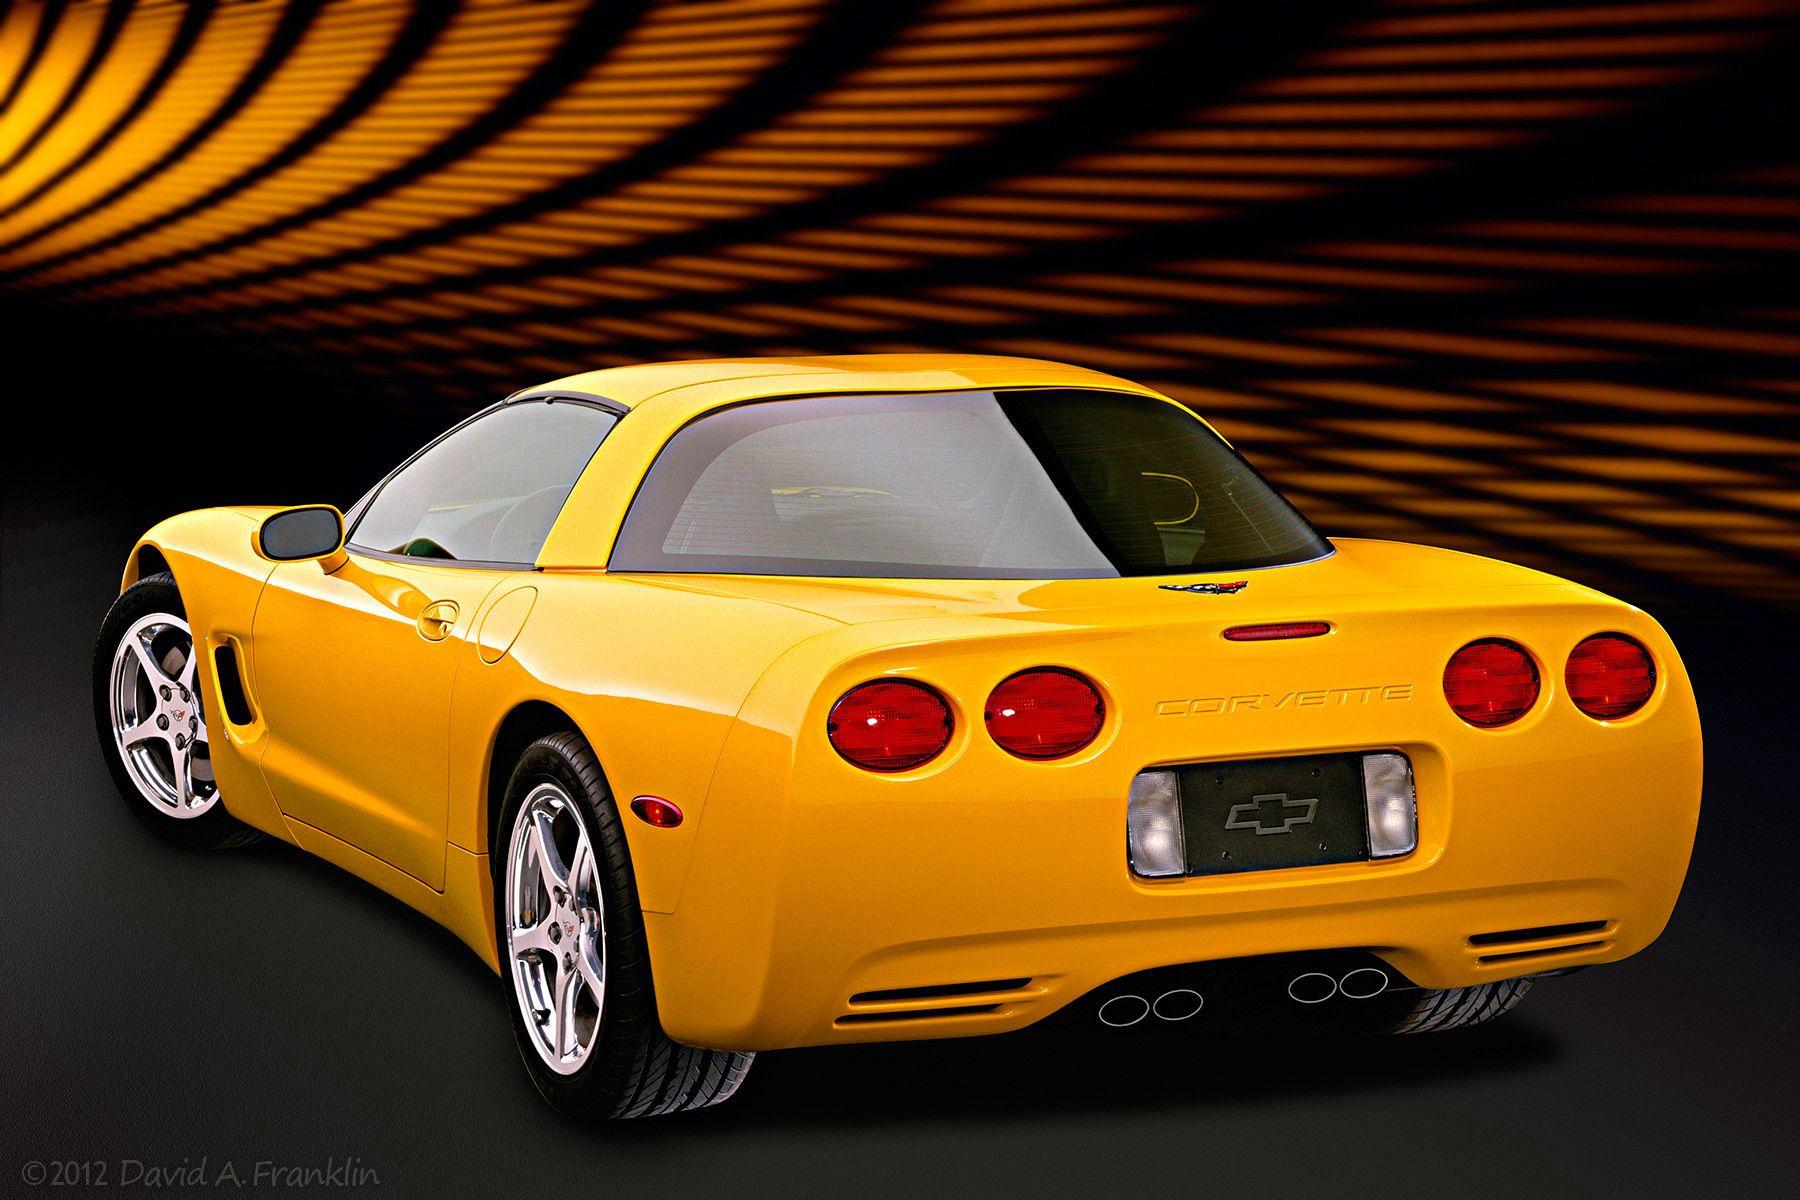 ChevroletCorvette_Yellow_R34_DigitalLightEffectsSet_Studio